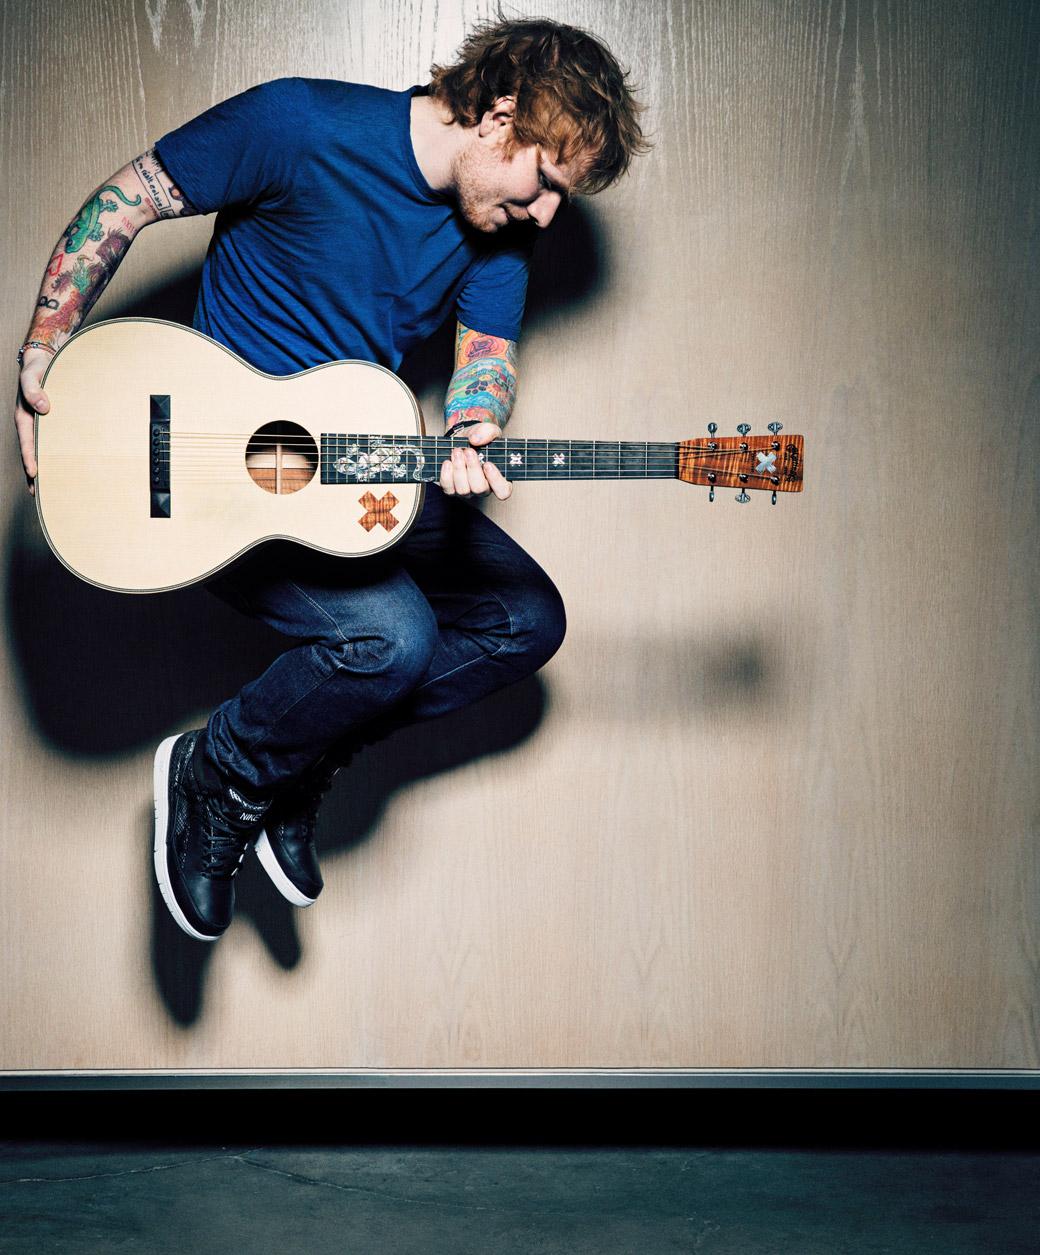 Ed-Sheeran-Jumping-with-Guitar